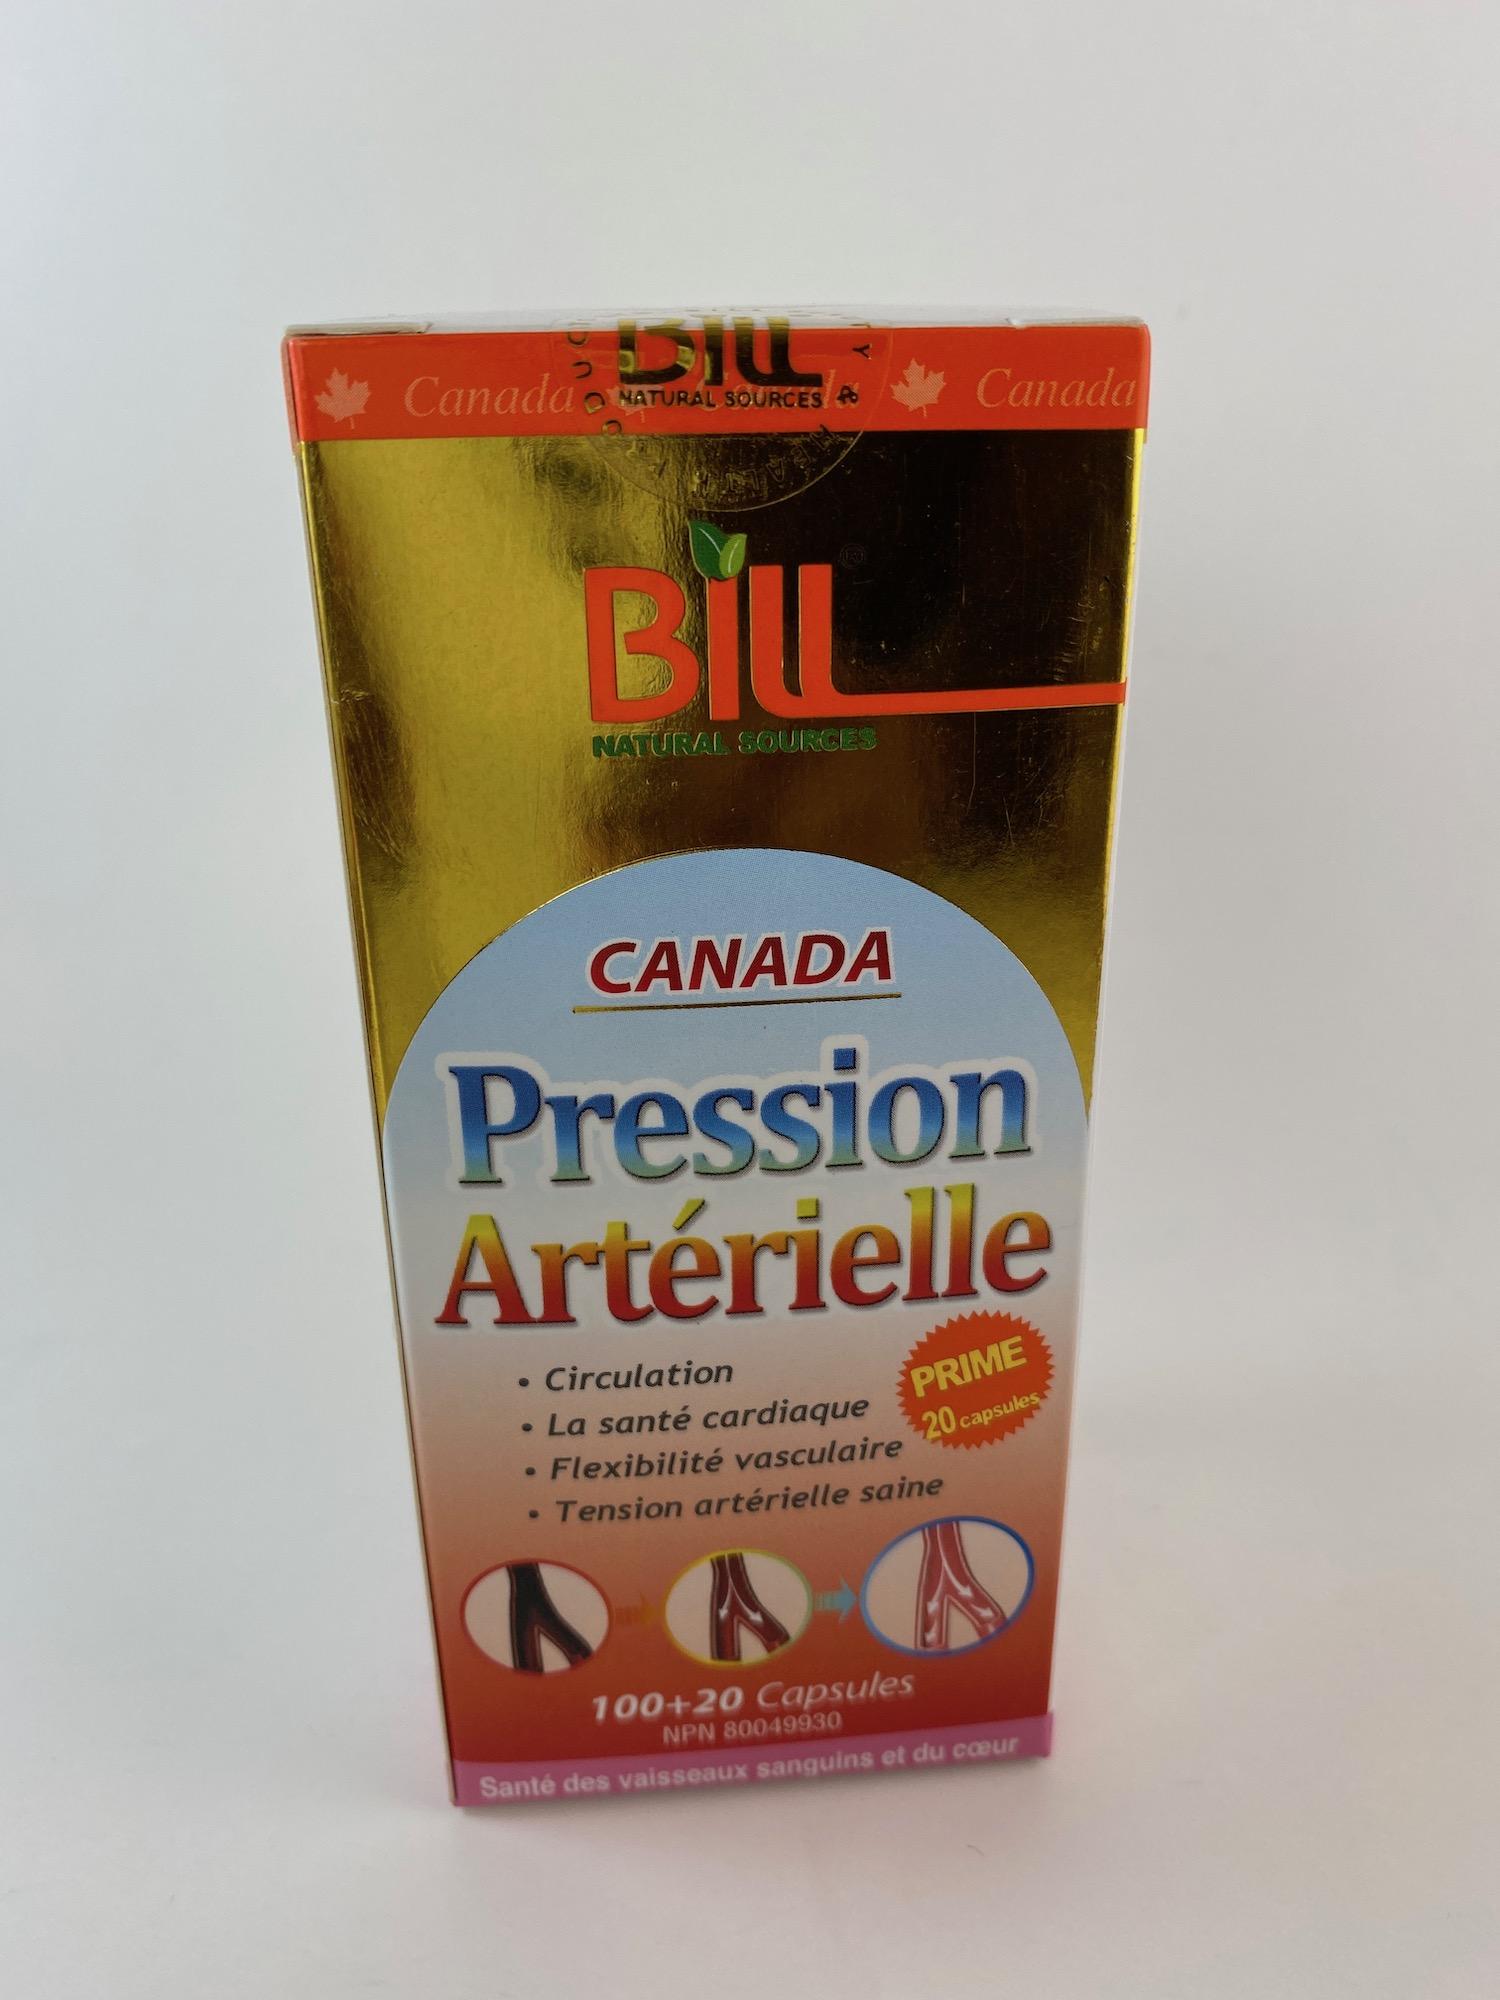 Bill Pression Artérielle - ProMed Pharmacy